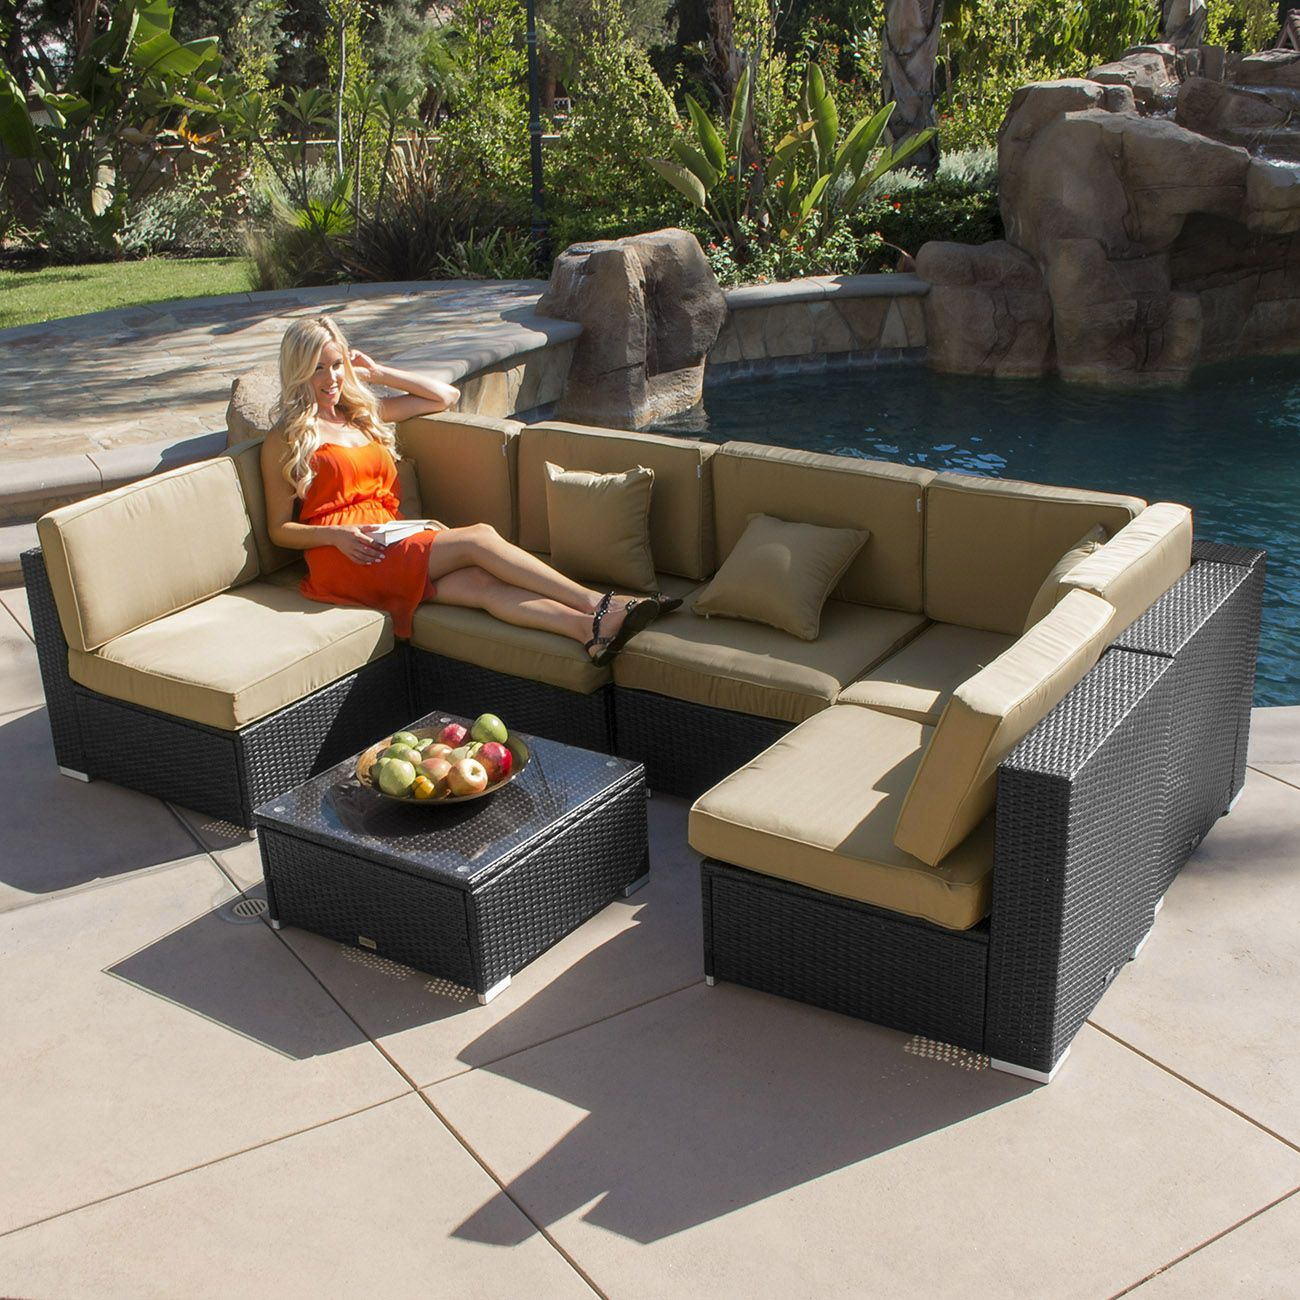 7pc Outdoor Patio Rattan Wicker Furniture Aluminum Sectional Sofa ...